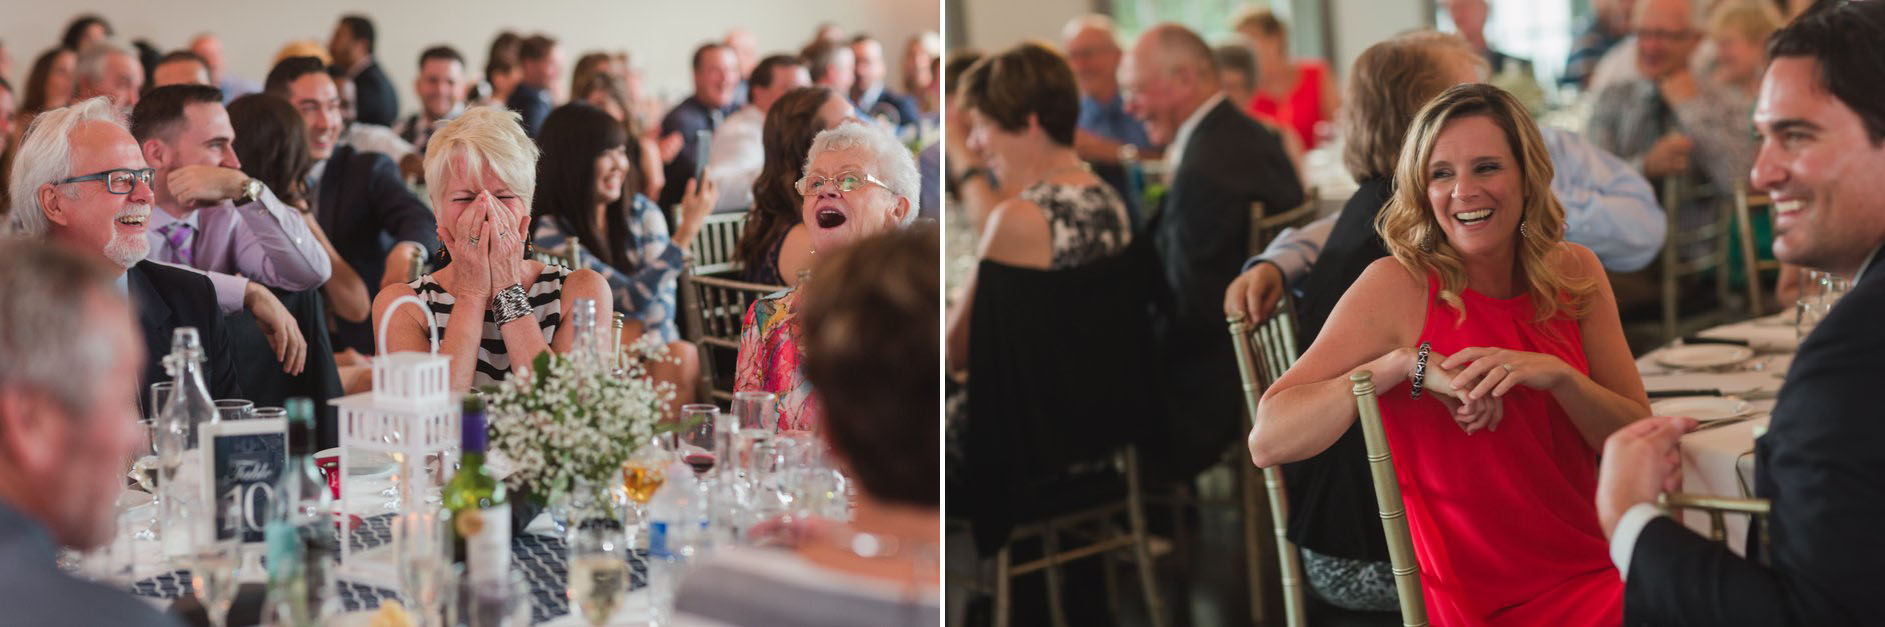 Kleinburg-Doctors-house-wedding-J-C-2016-063